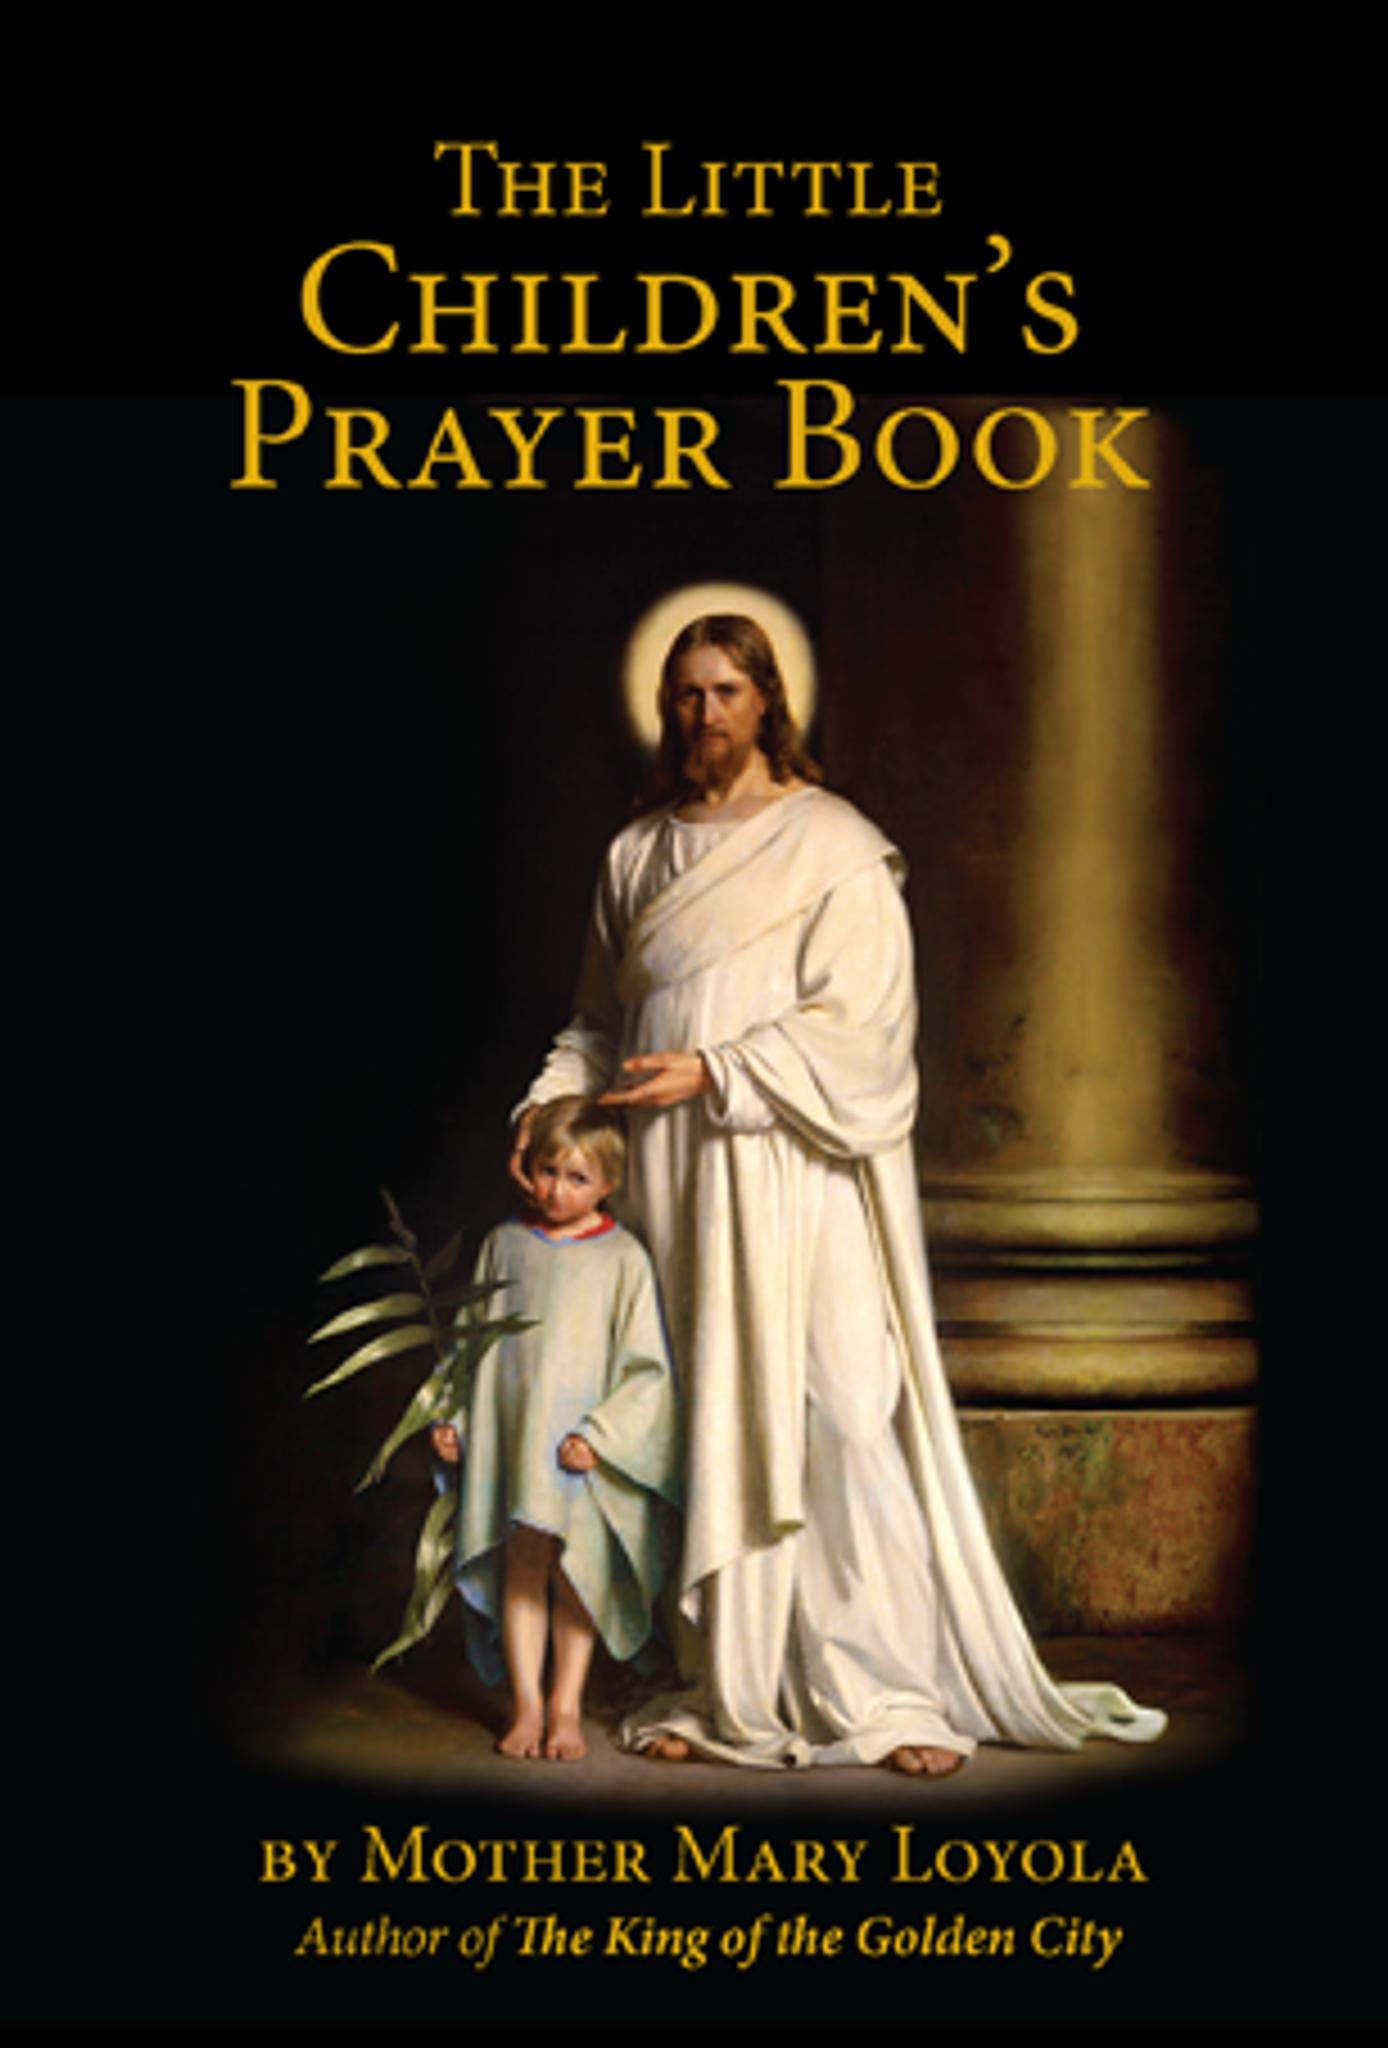 Little Children's Prayer Book